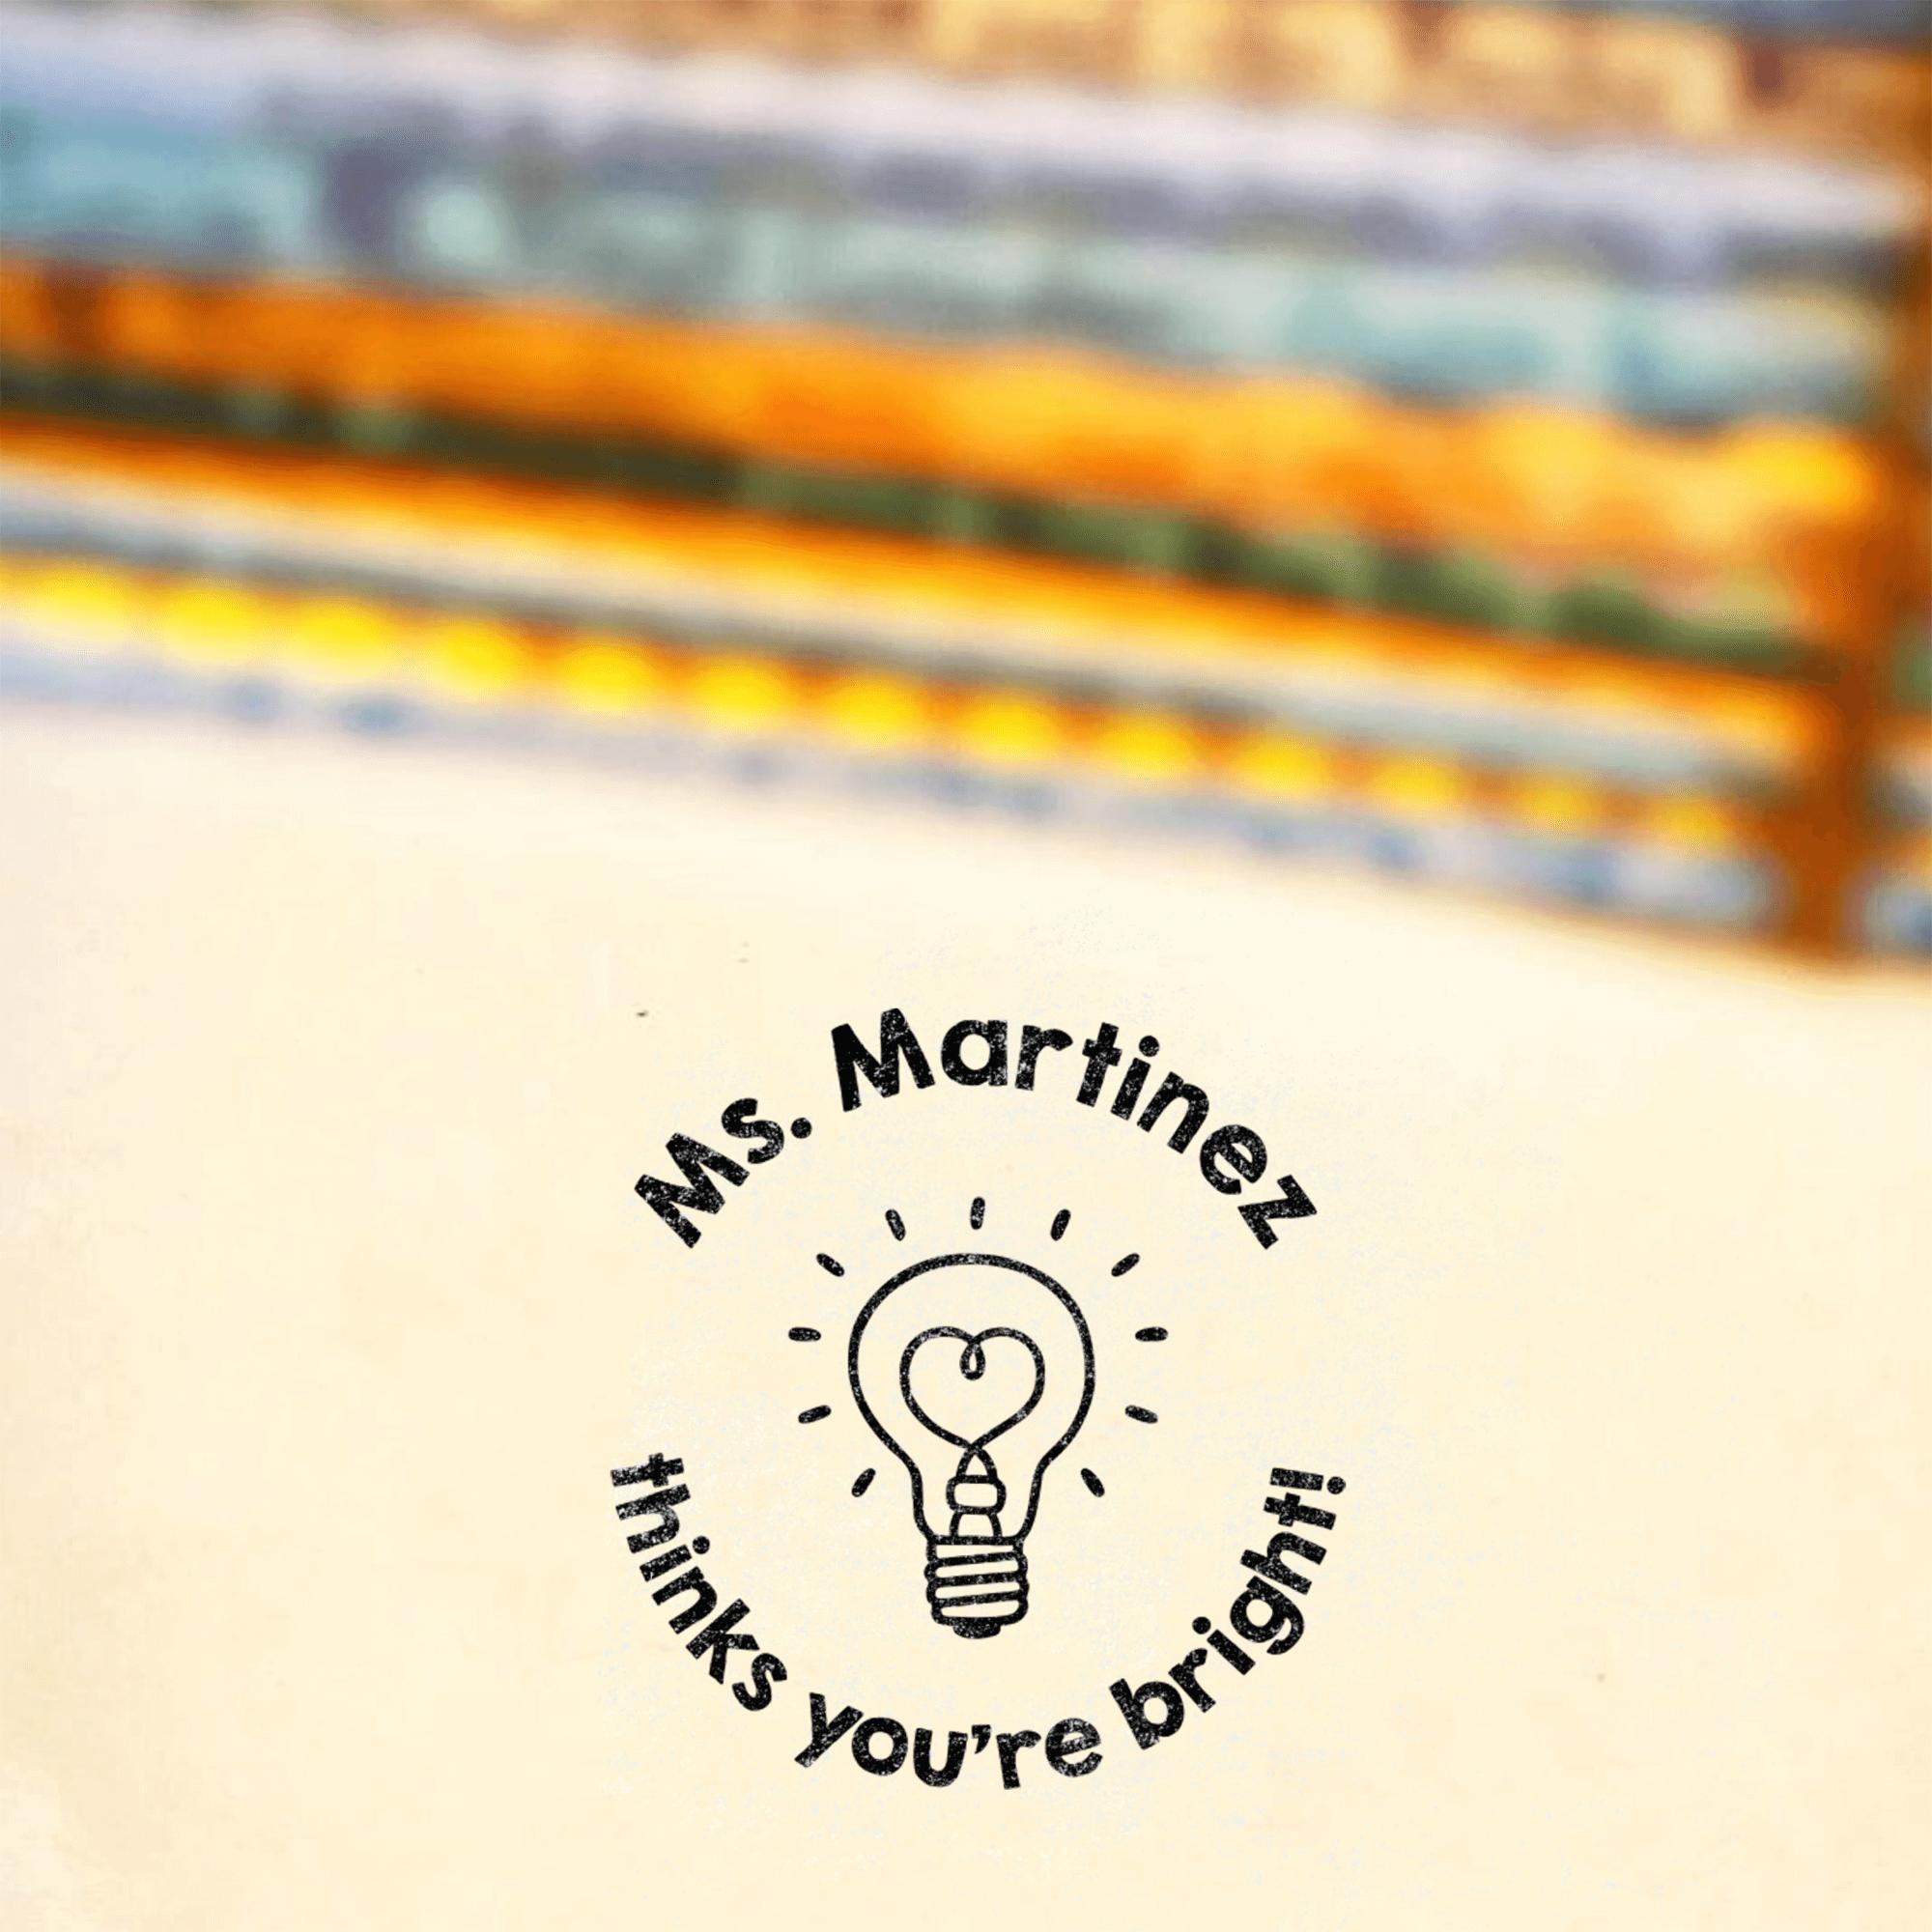 Cute Lightbulb 'You're Brilliant' Grading Stamp